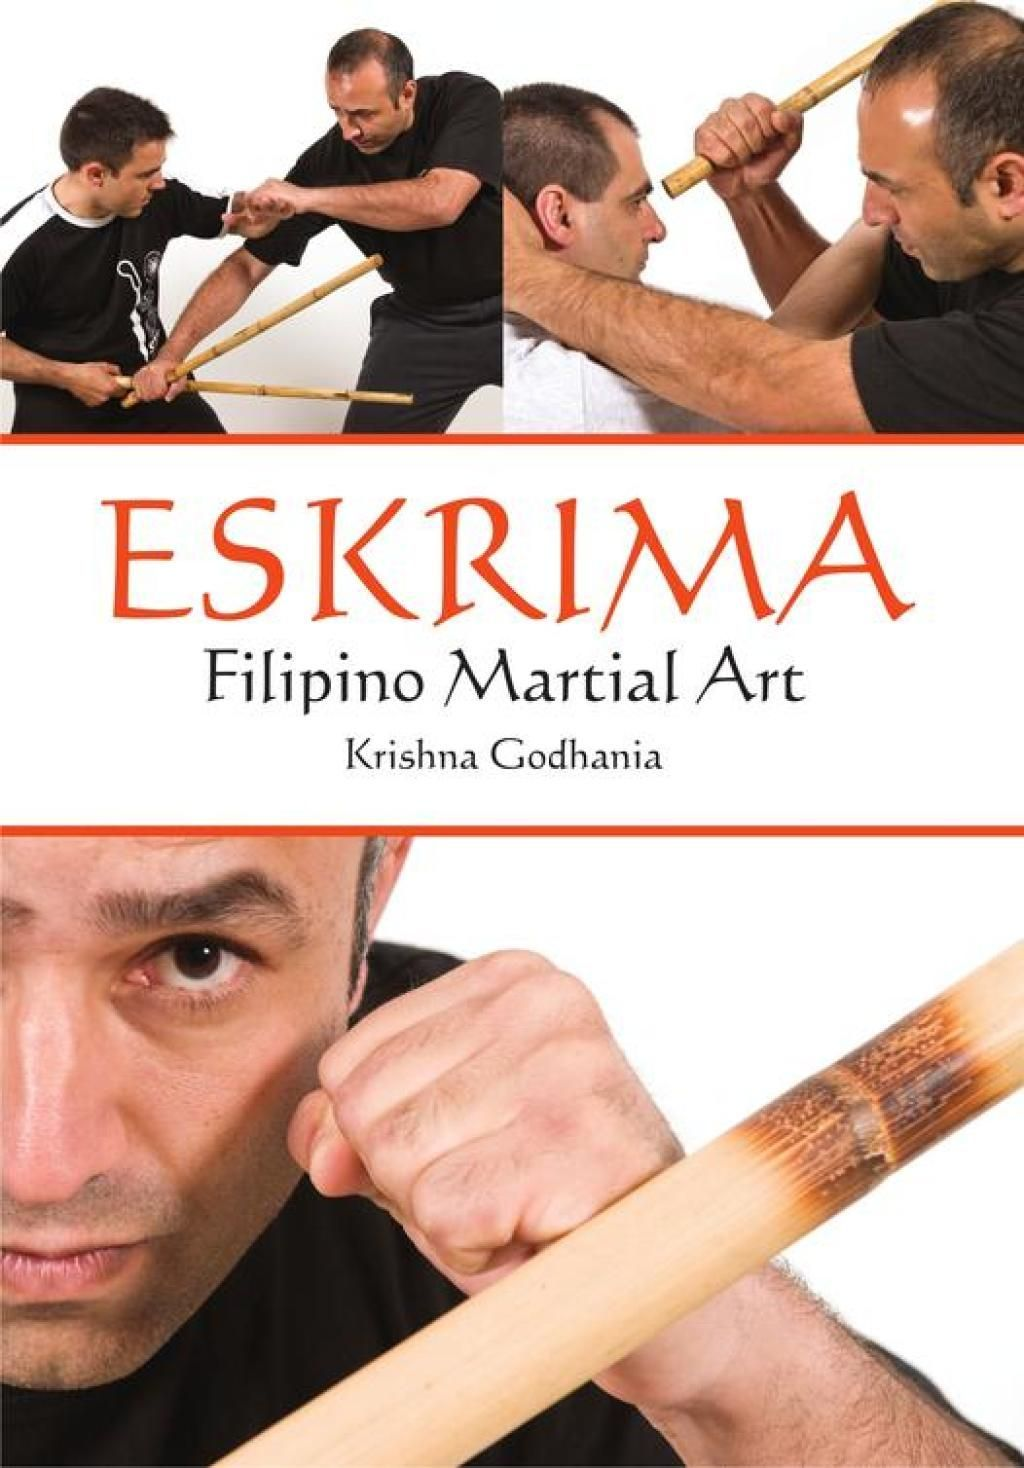 Eskrima ebook self defense tips filipino martial arts